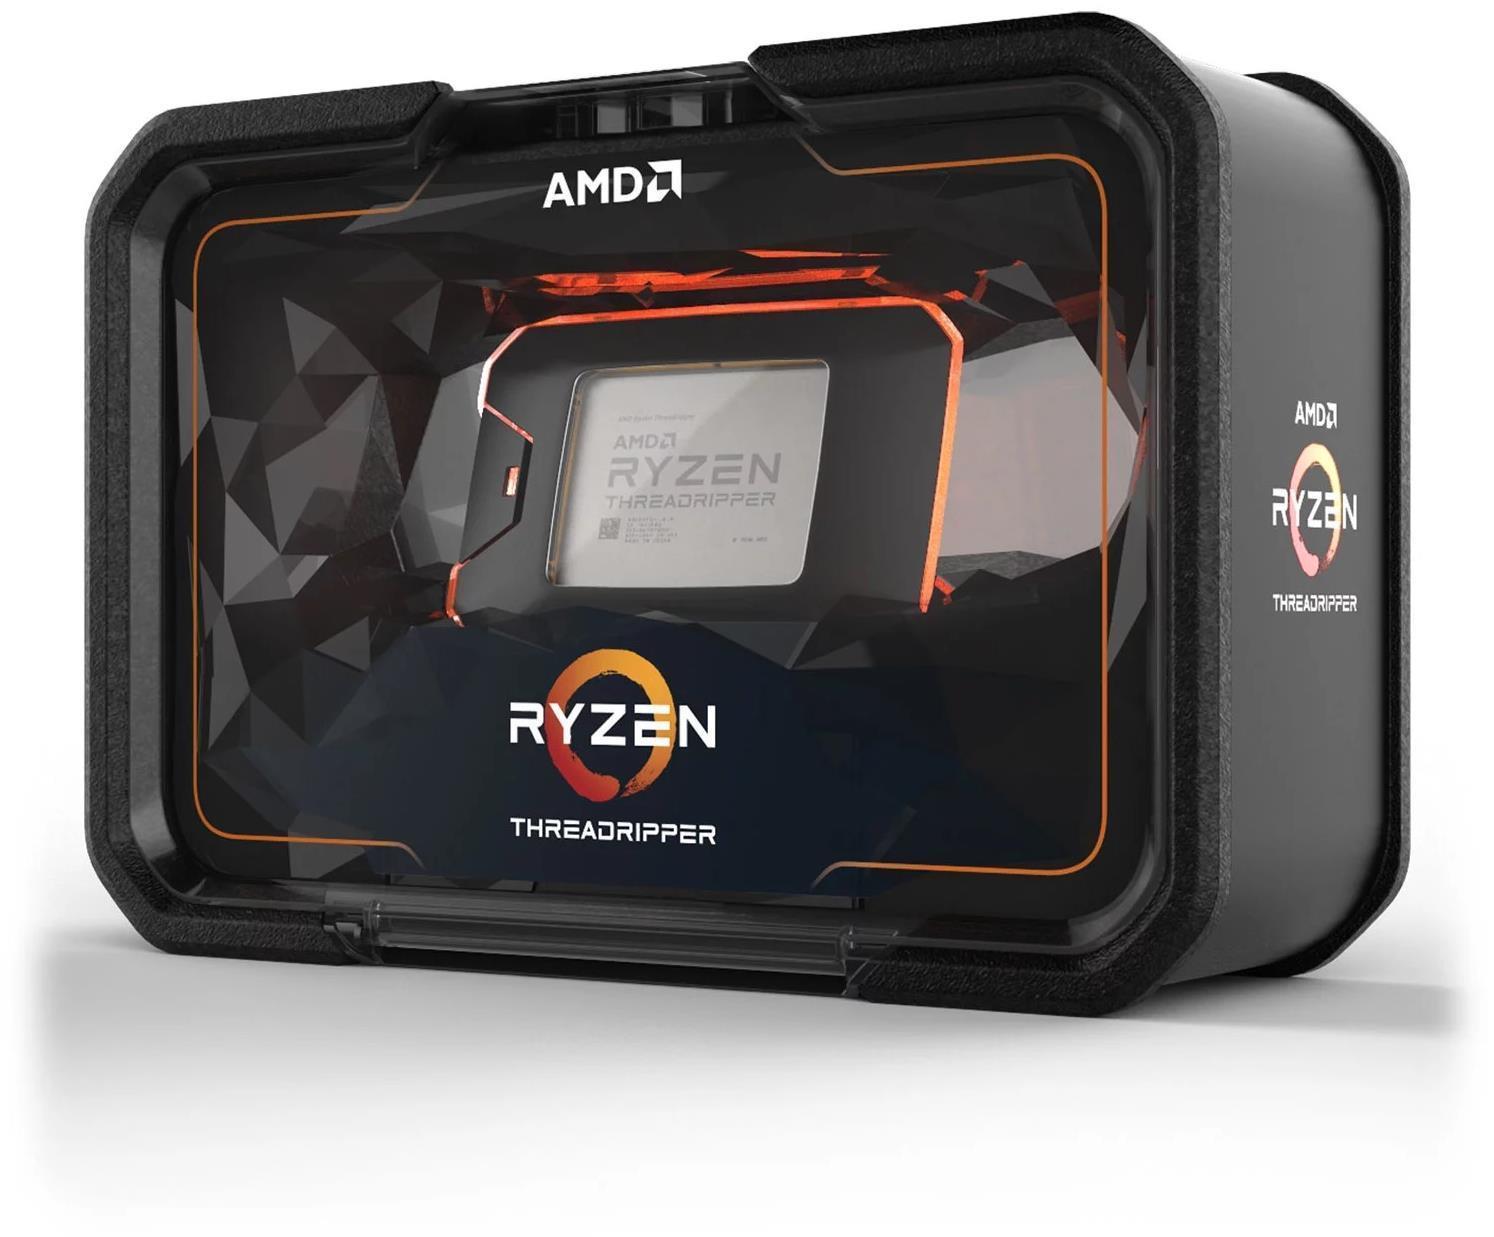 AMD Ryzen Threadripper 2920X Processor (Socket TR4) - £136.20 delivered @ Box.co.uk